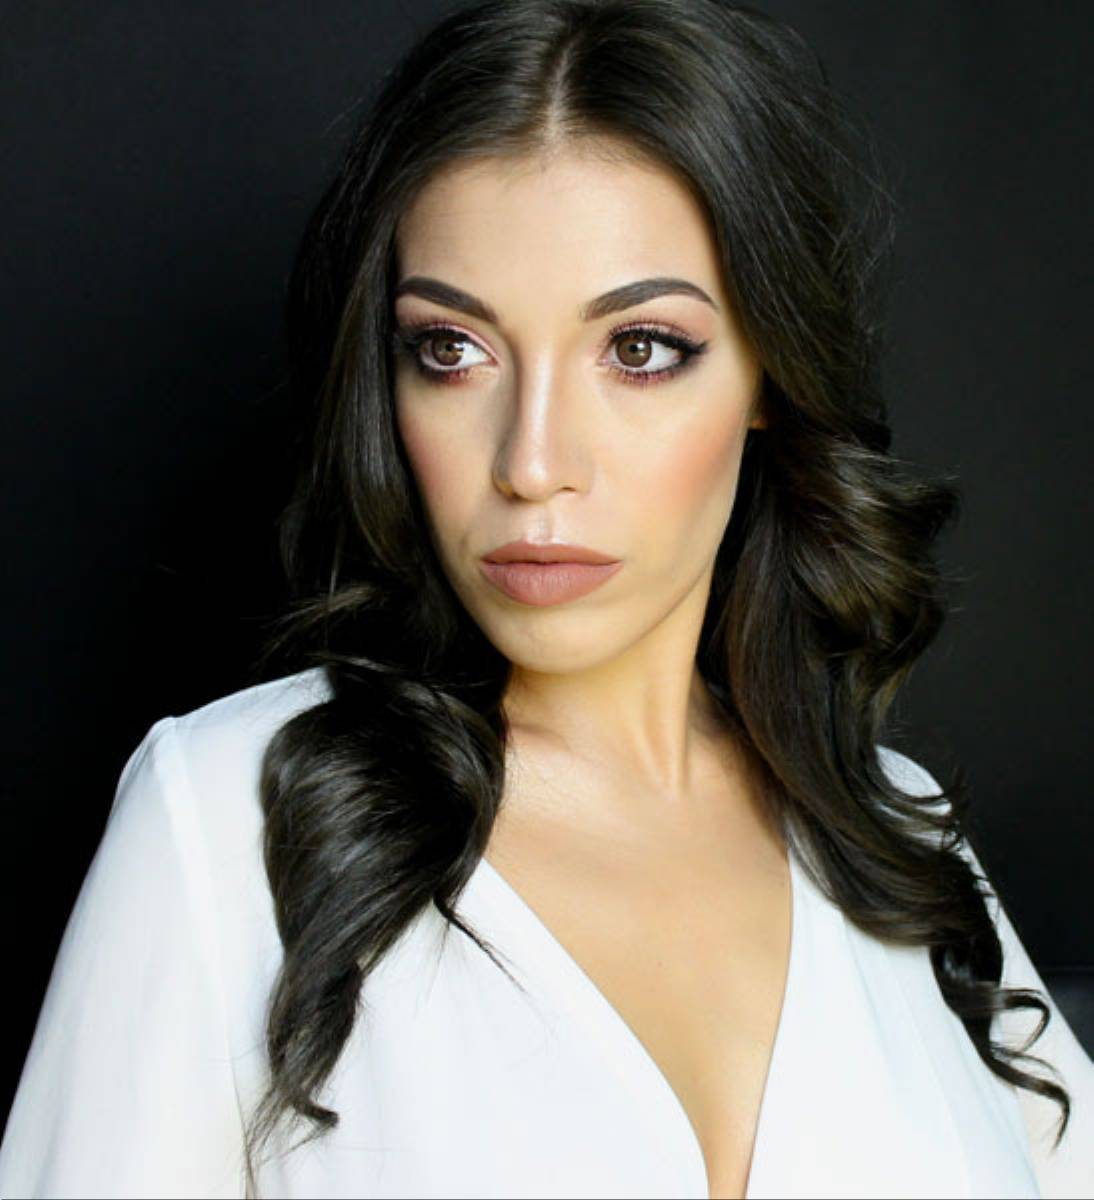 make-up-by-agnieszka-broda_